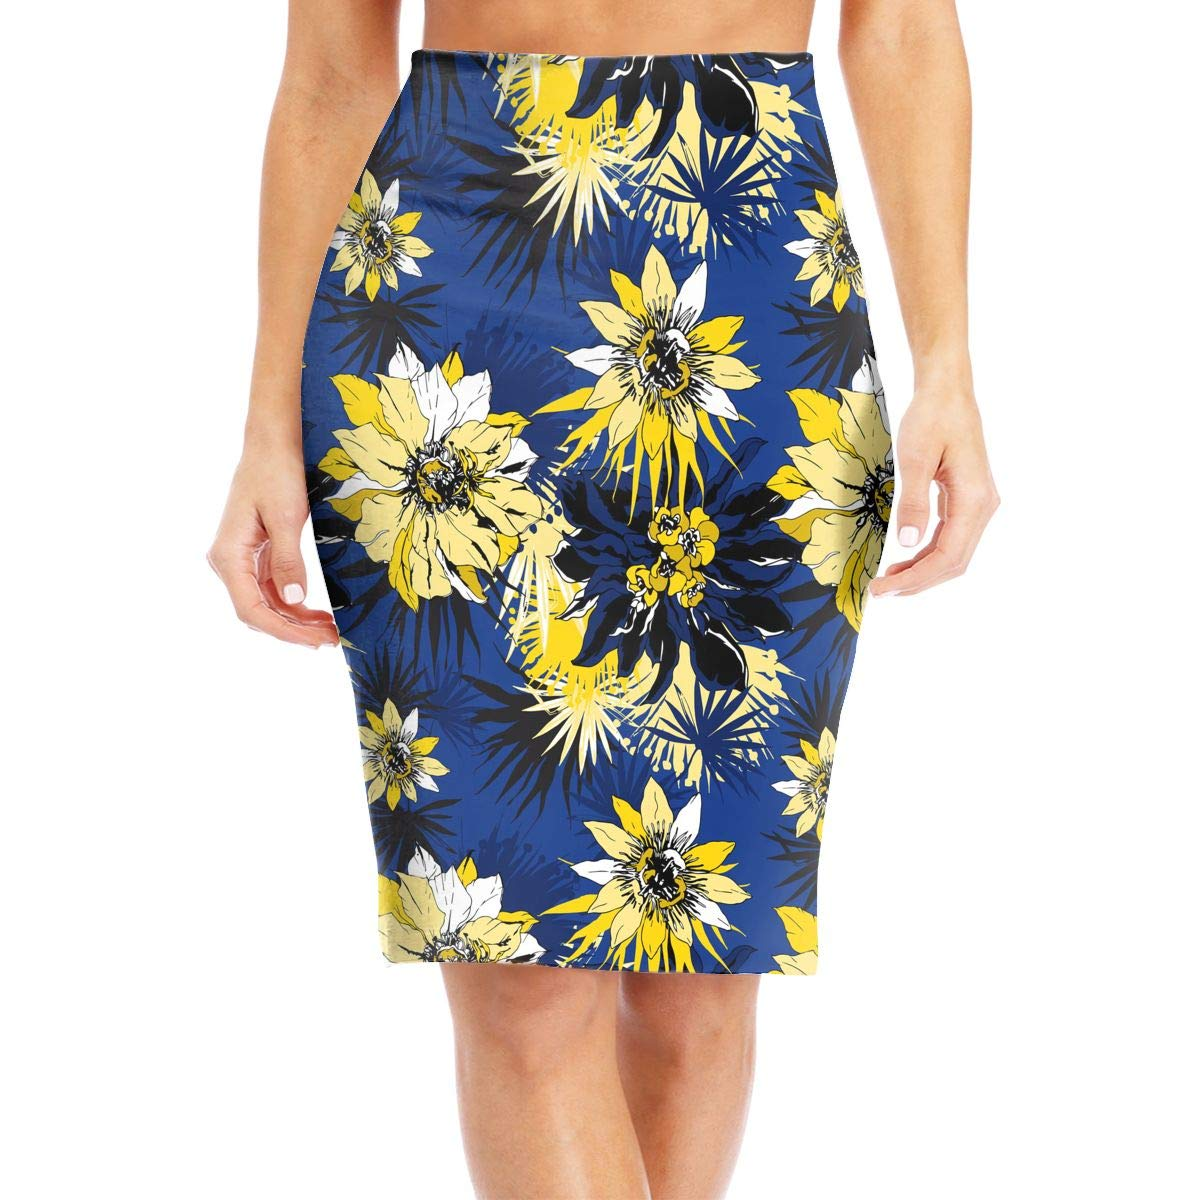 04f1bf912e4a4 Amazon.com: ZSJRH-M Women's Sexy Slim Mid Skirt Yellow Exotic ...